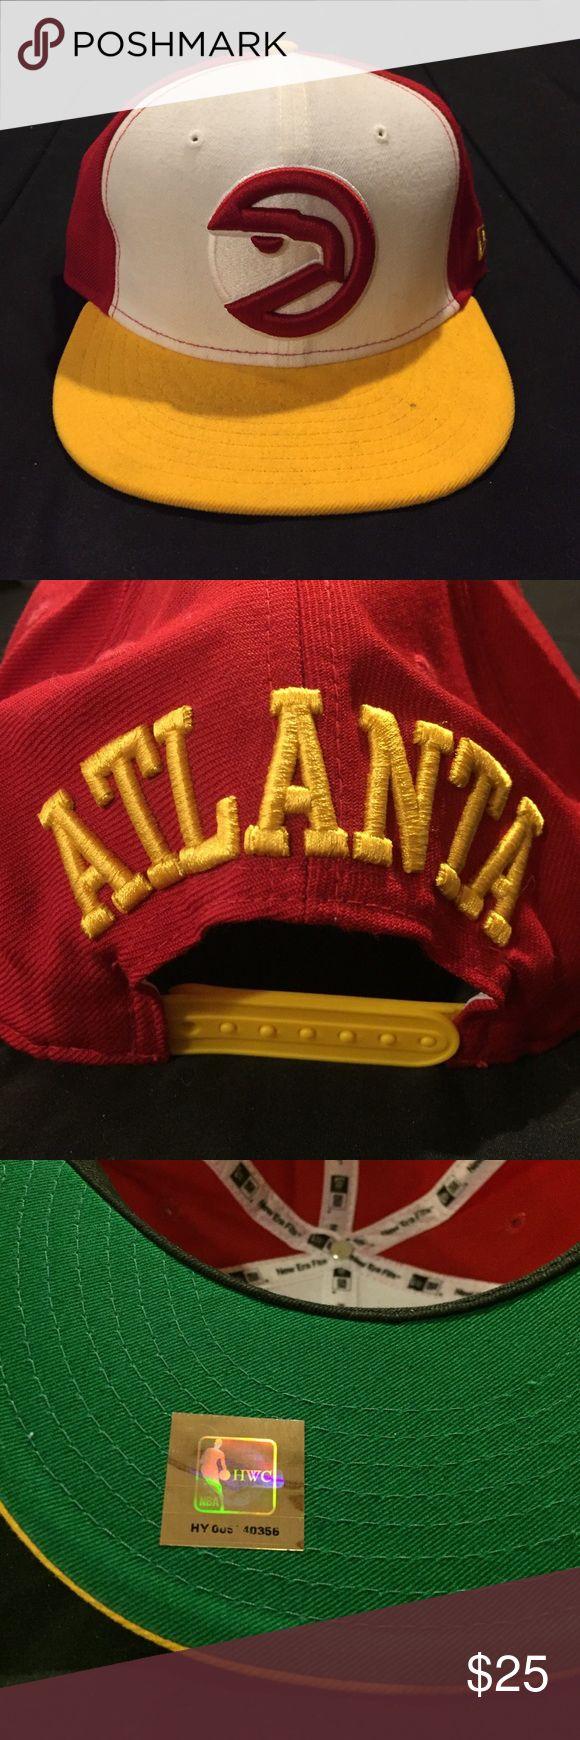 New Era Atlanta Hawks SnapBack Like new condition. New Era Atlanta Hawks SnapBack. No trades New Era Accessories Hats